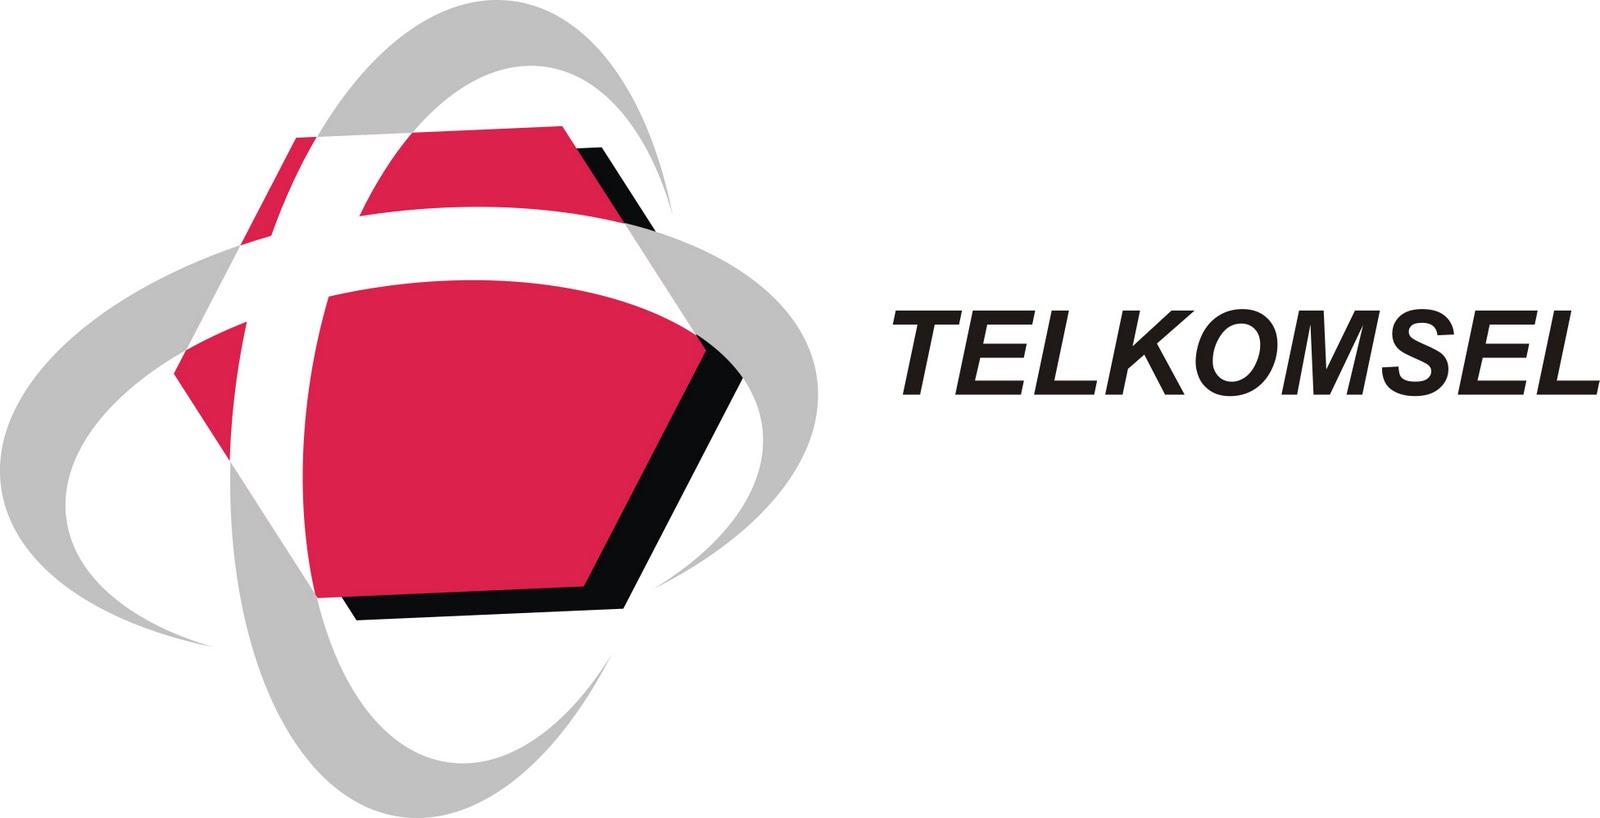 first image of Arti Logo Telkom with Arti logo Telkomsel ~ @rie fabian